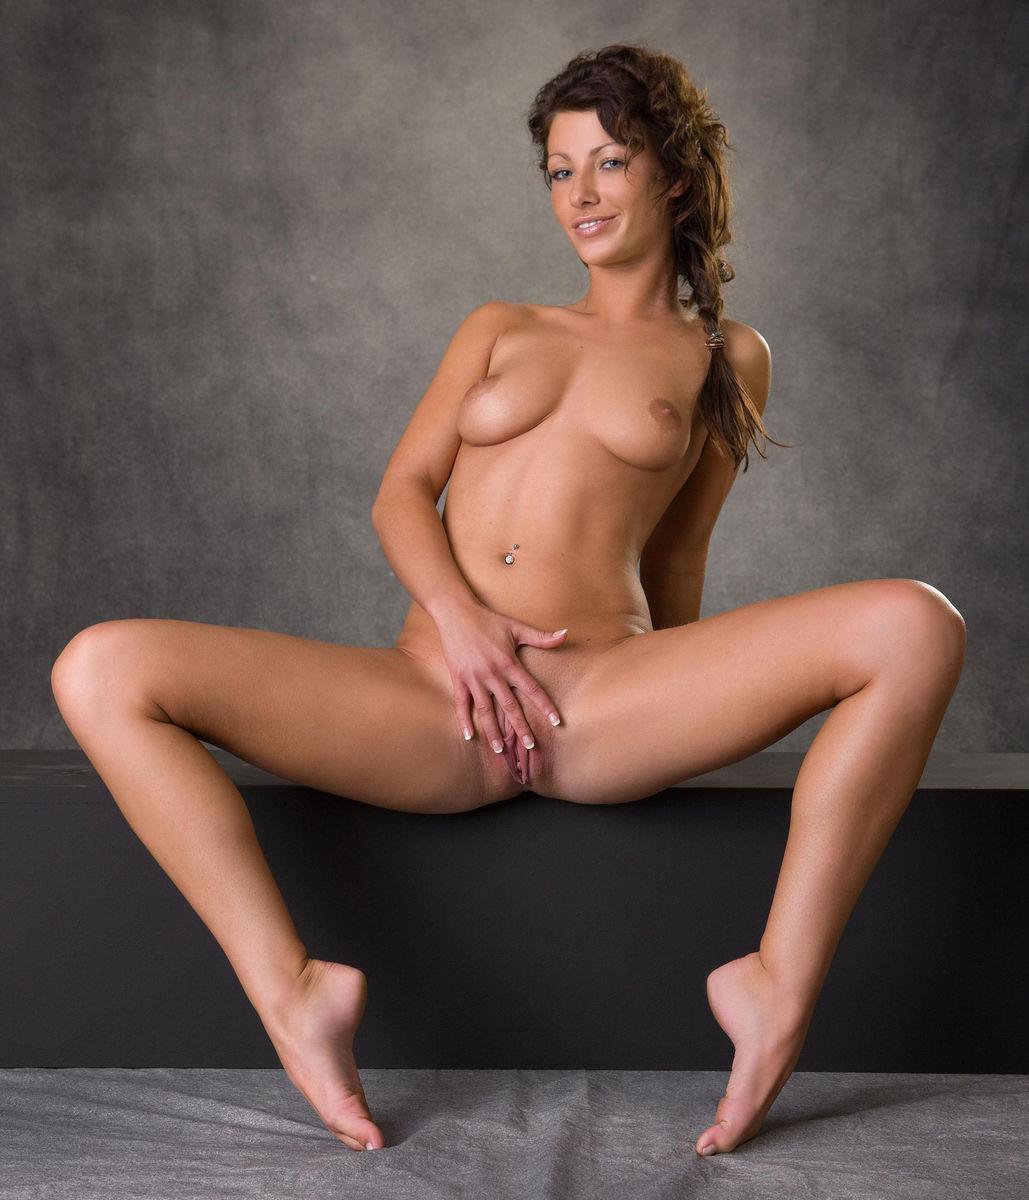 Horny nude black women porn photos flicking